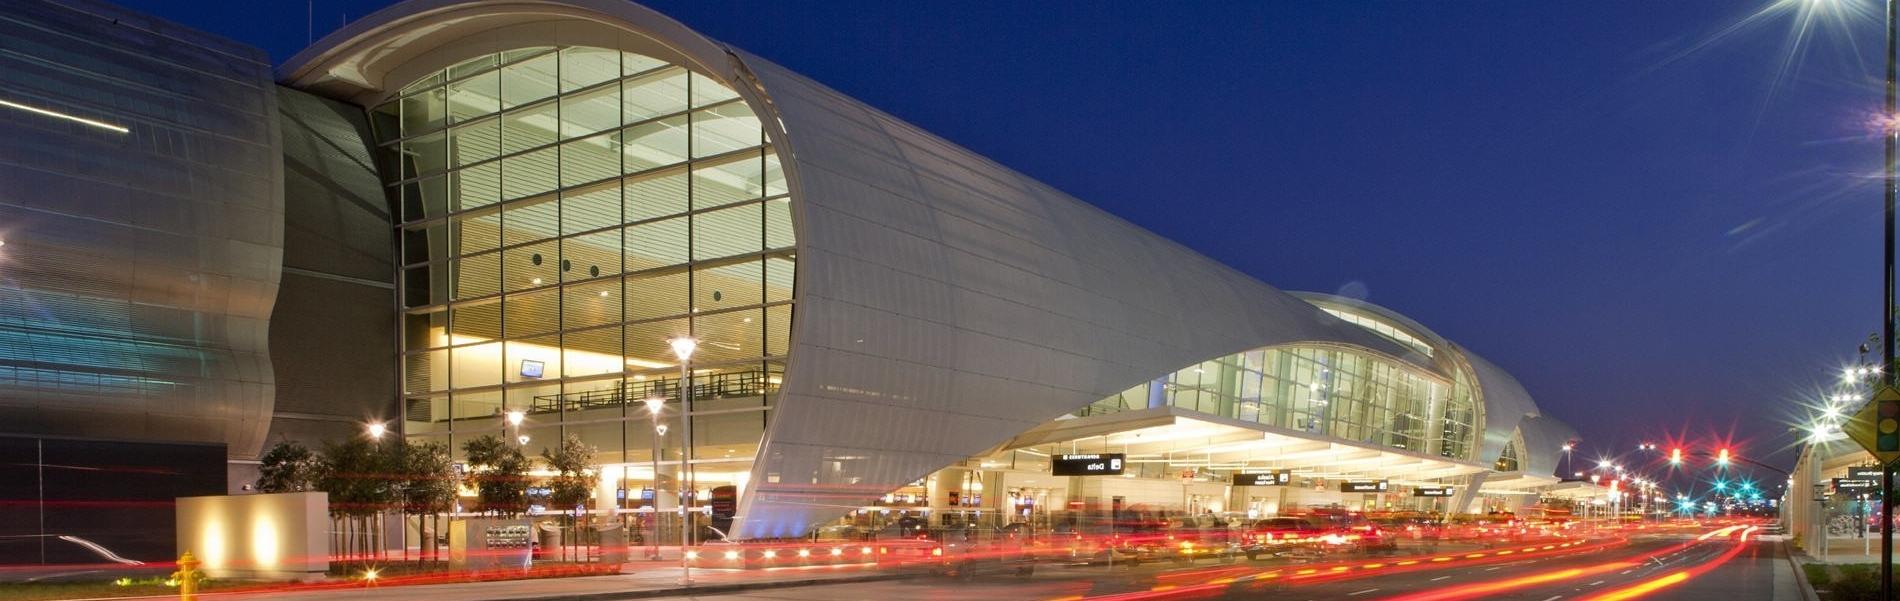 San Jose Airport Transportation Information California Inside San Jose Convention Center Calendar